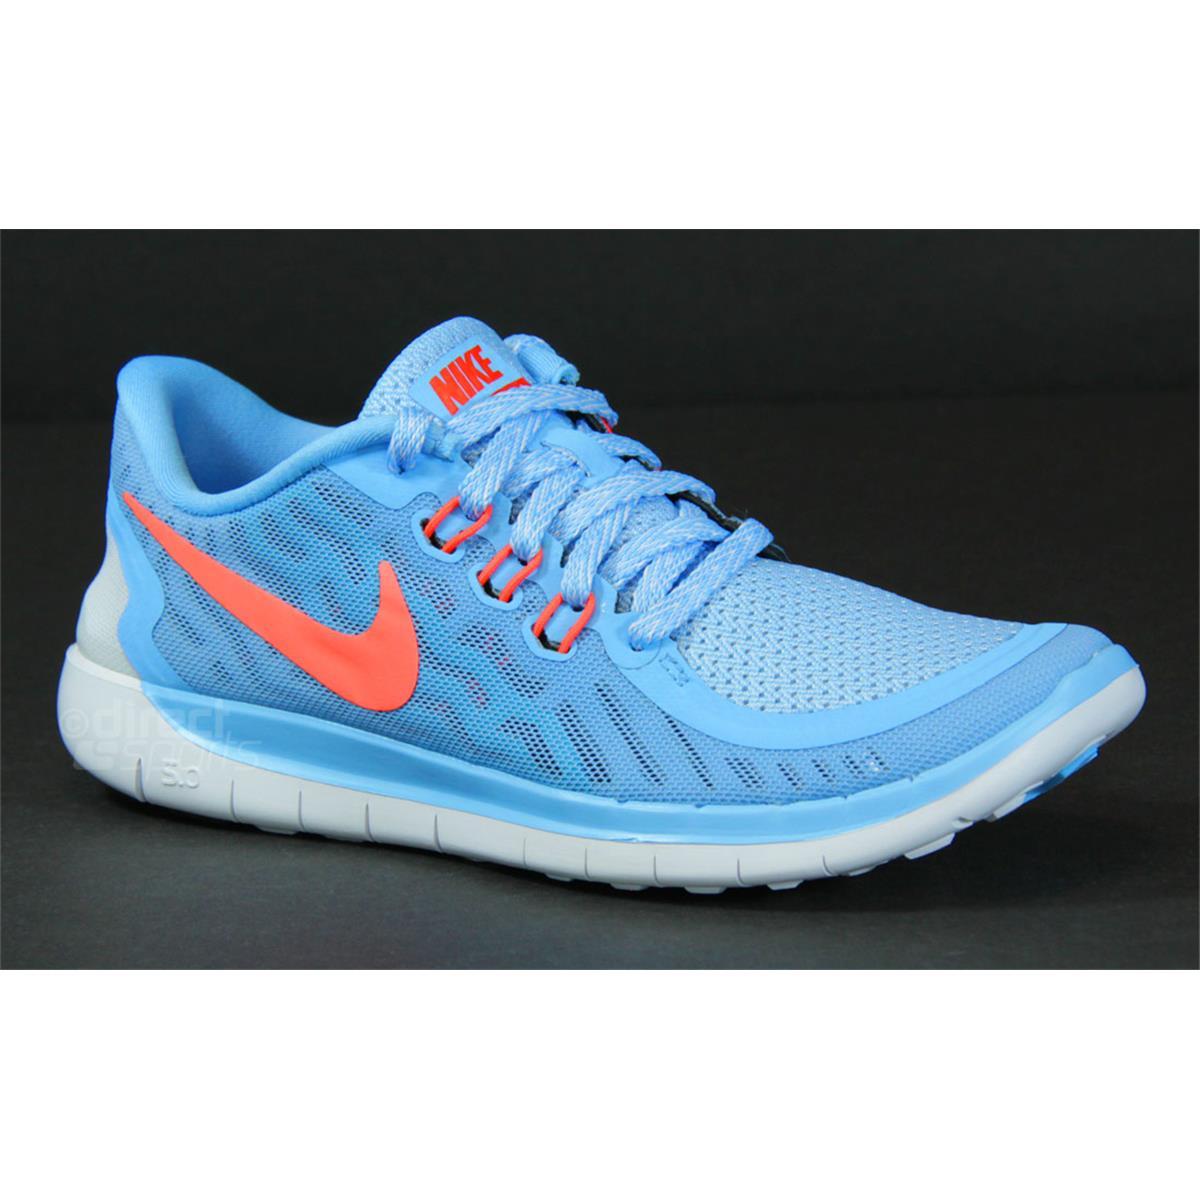 Nike Free 5.0 (GS) Junior Running Shoes SP15 Junior Blue